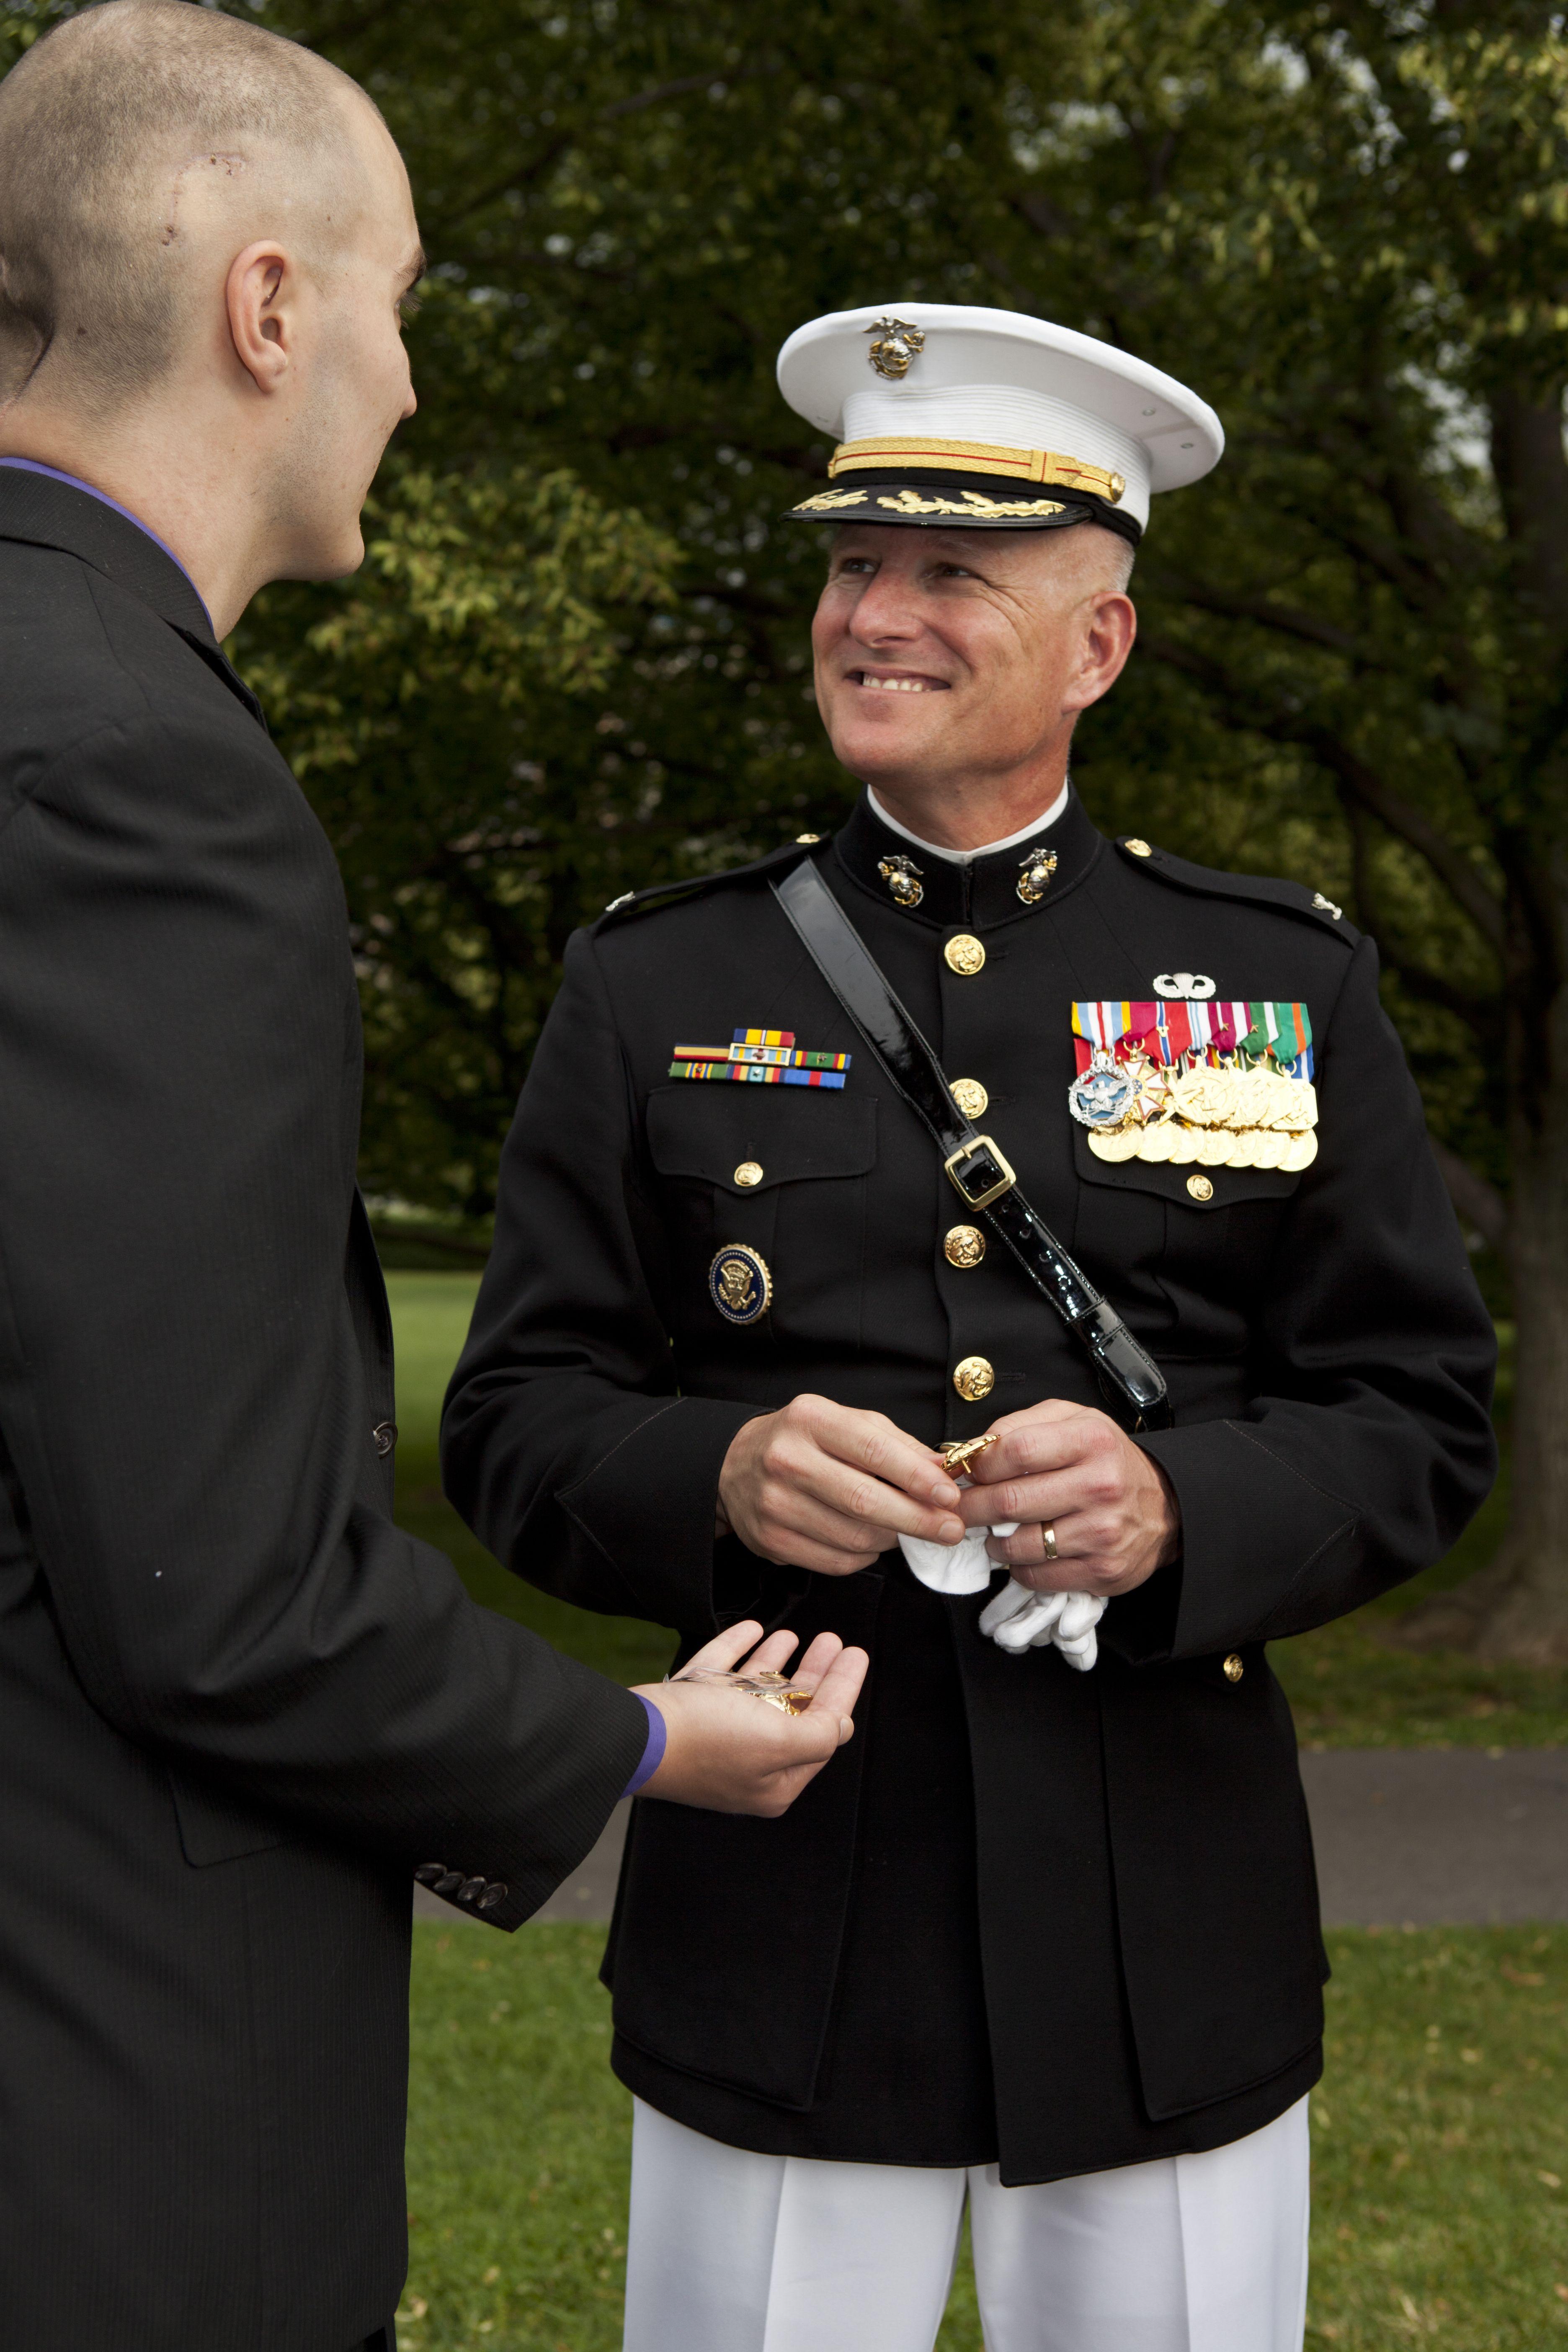 us marine corp uniform